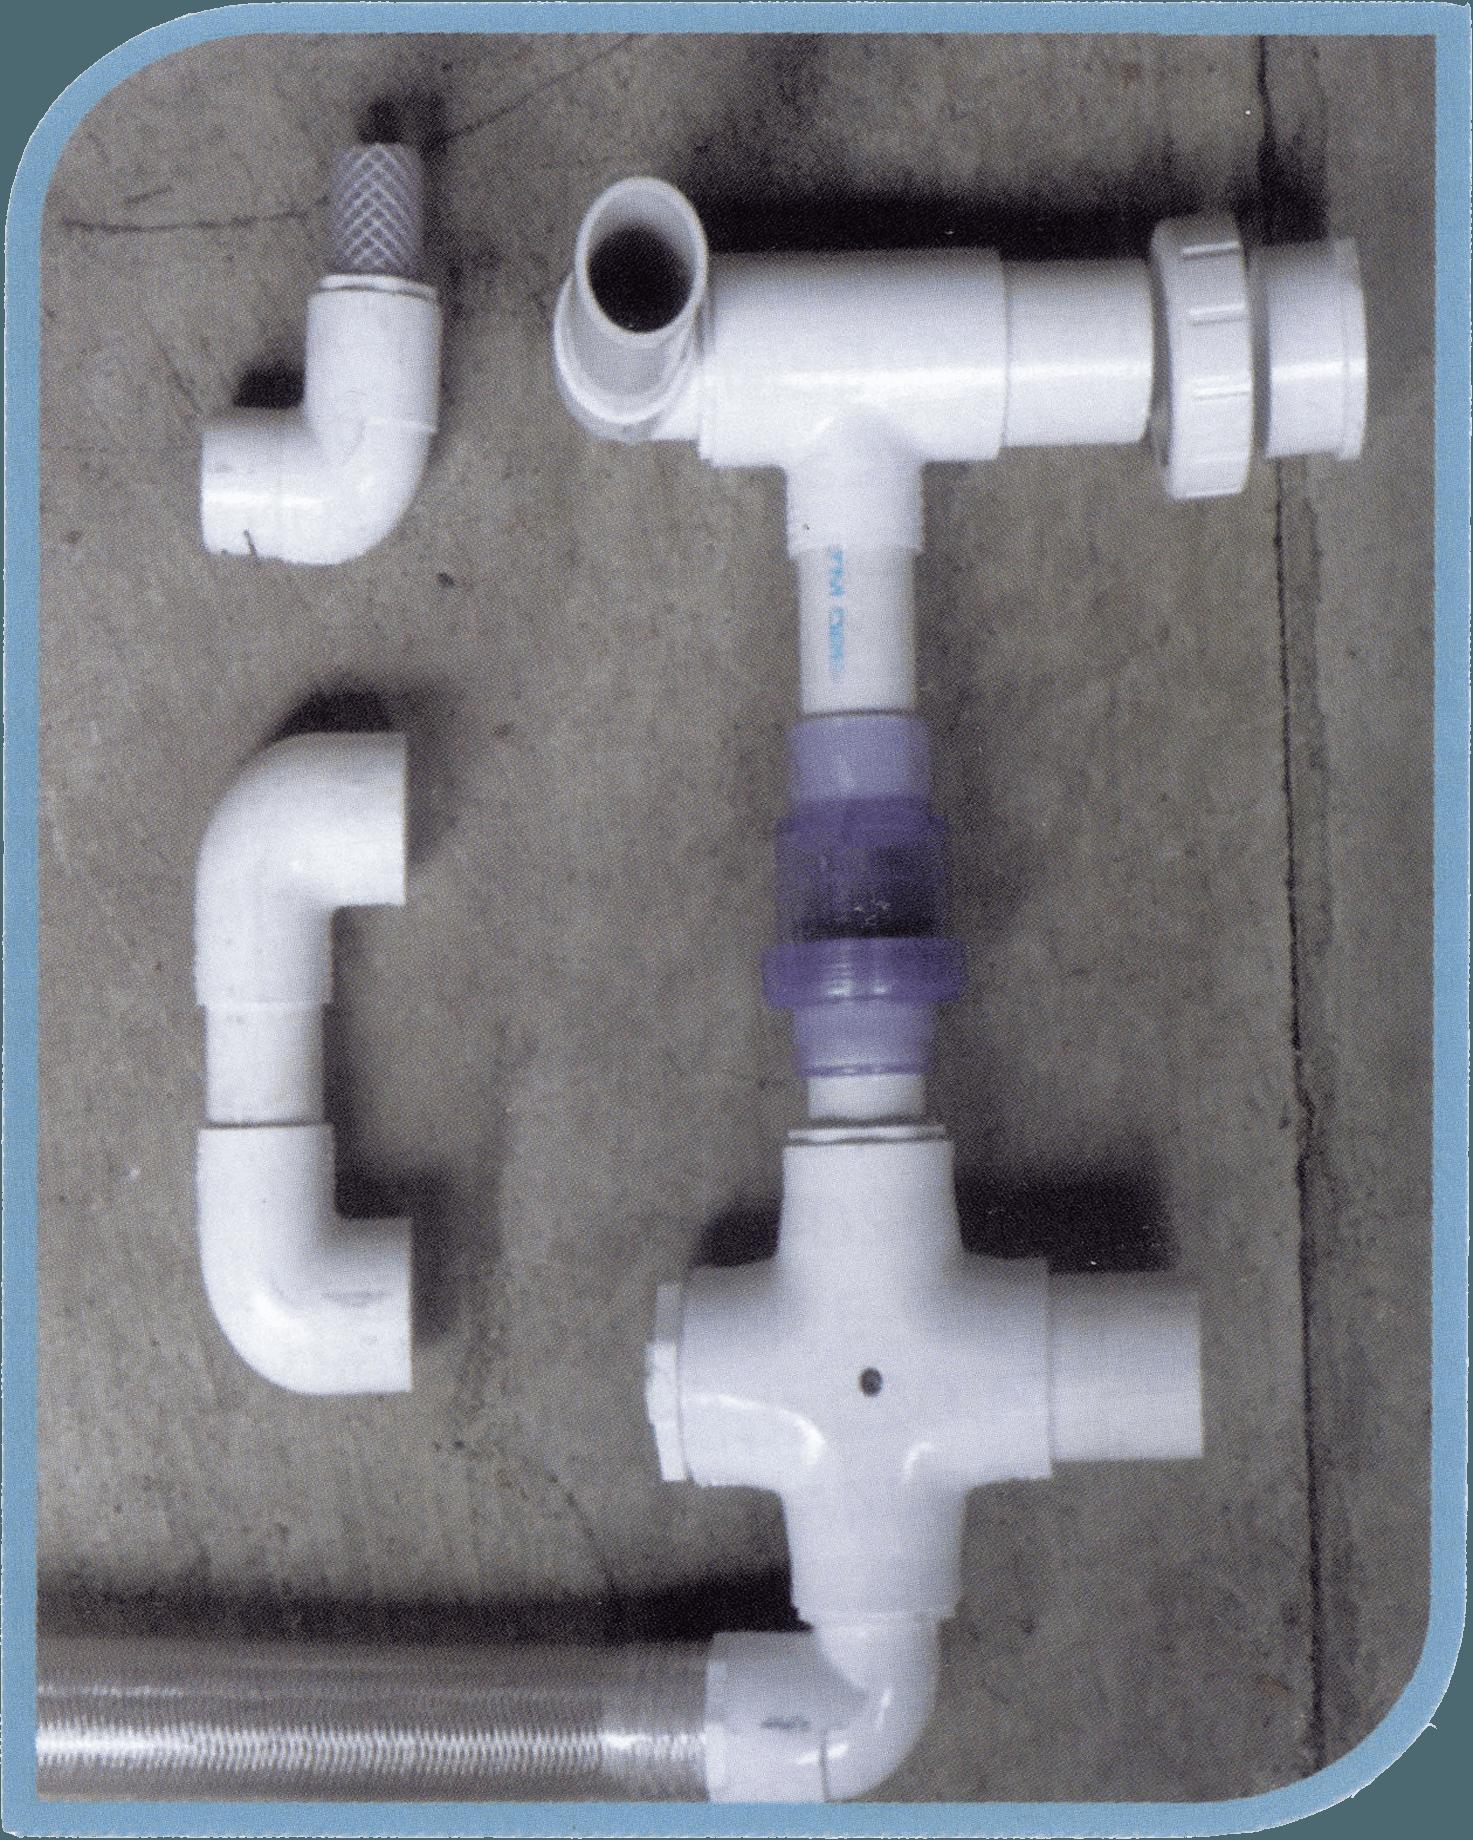 Rome Industries Pool Heat Pump Parts Medallion Energy